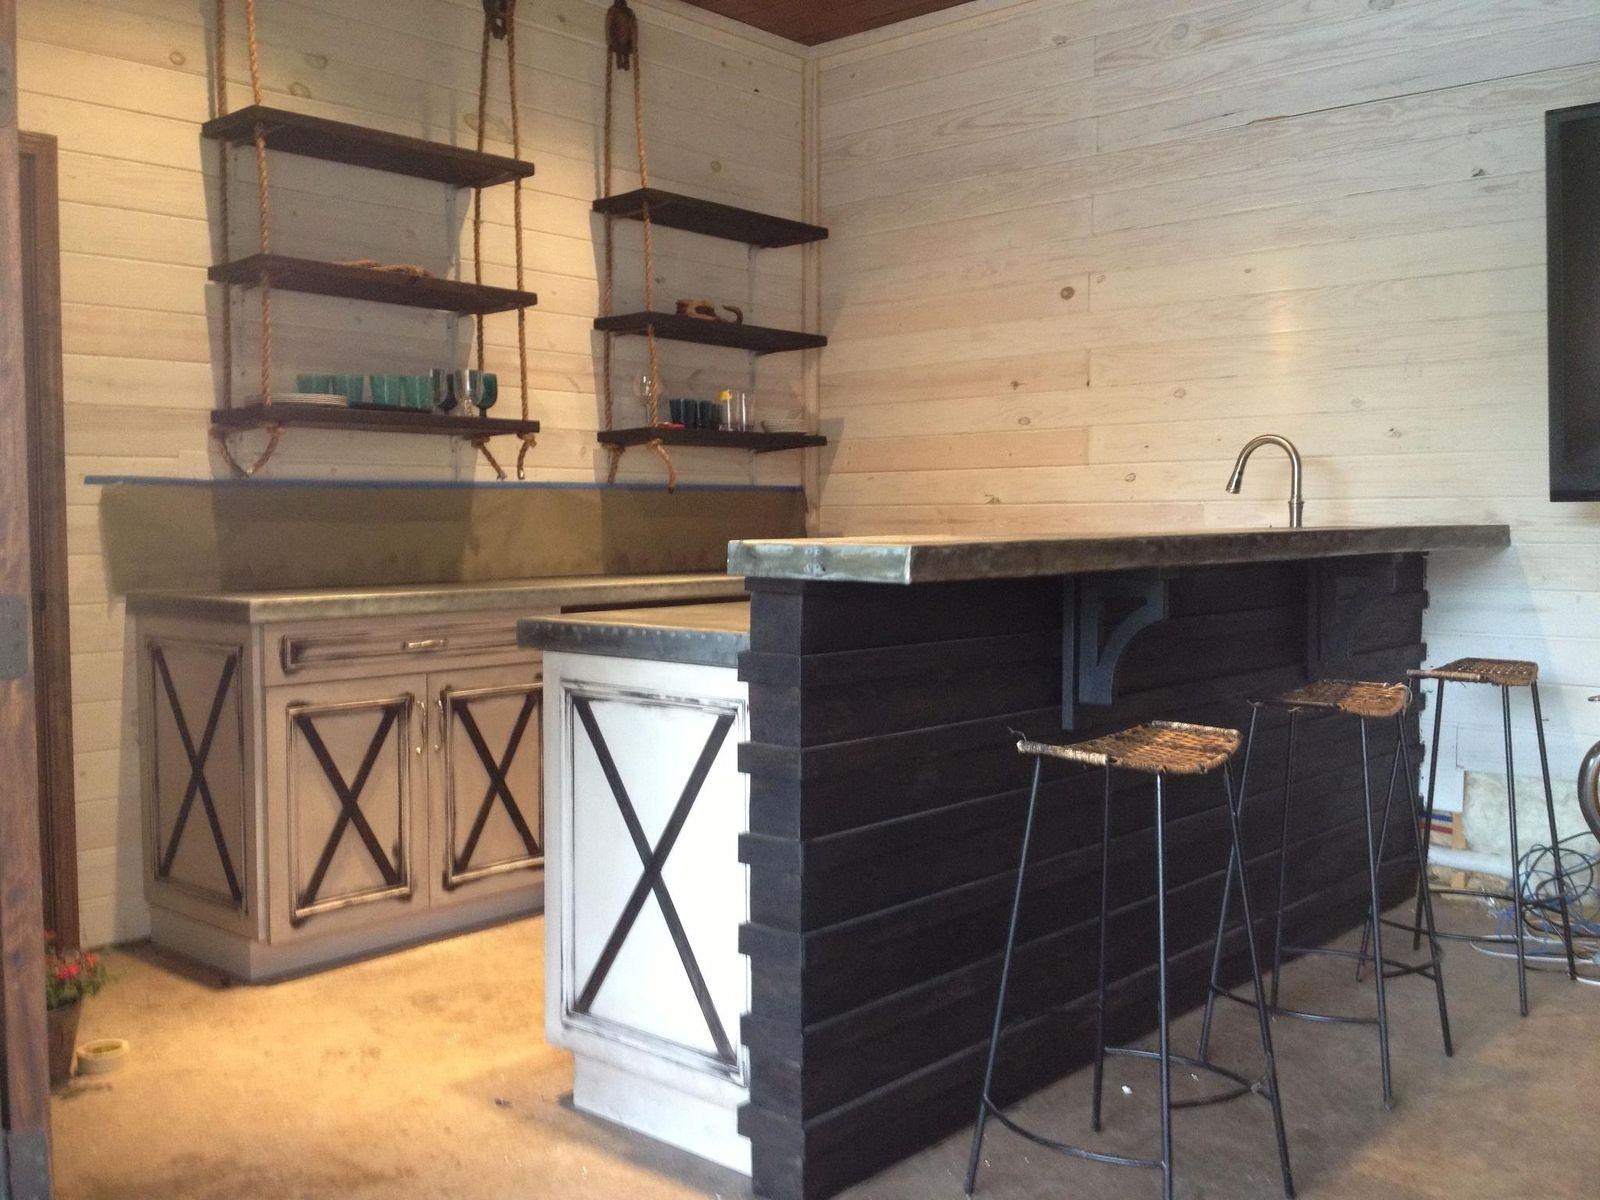 built in wine rack kitchen cabinets hood fans hand made custom zinc countertops by kidd ...